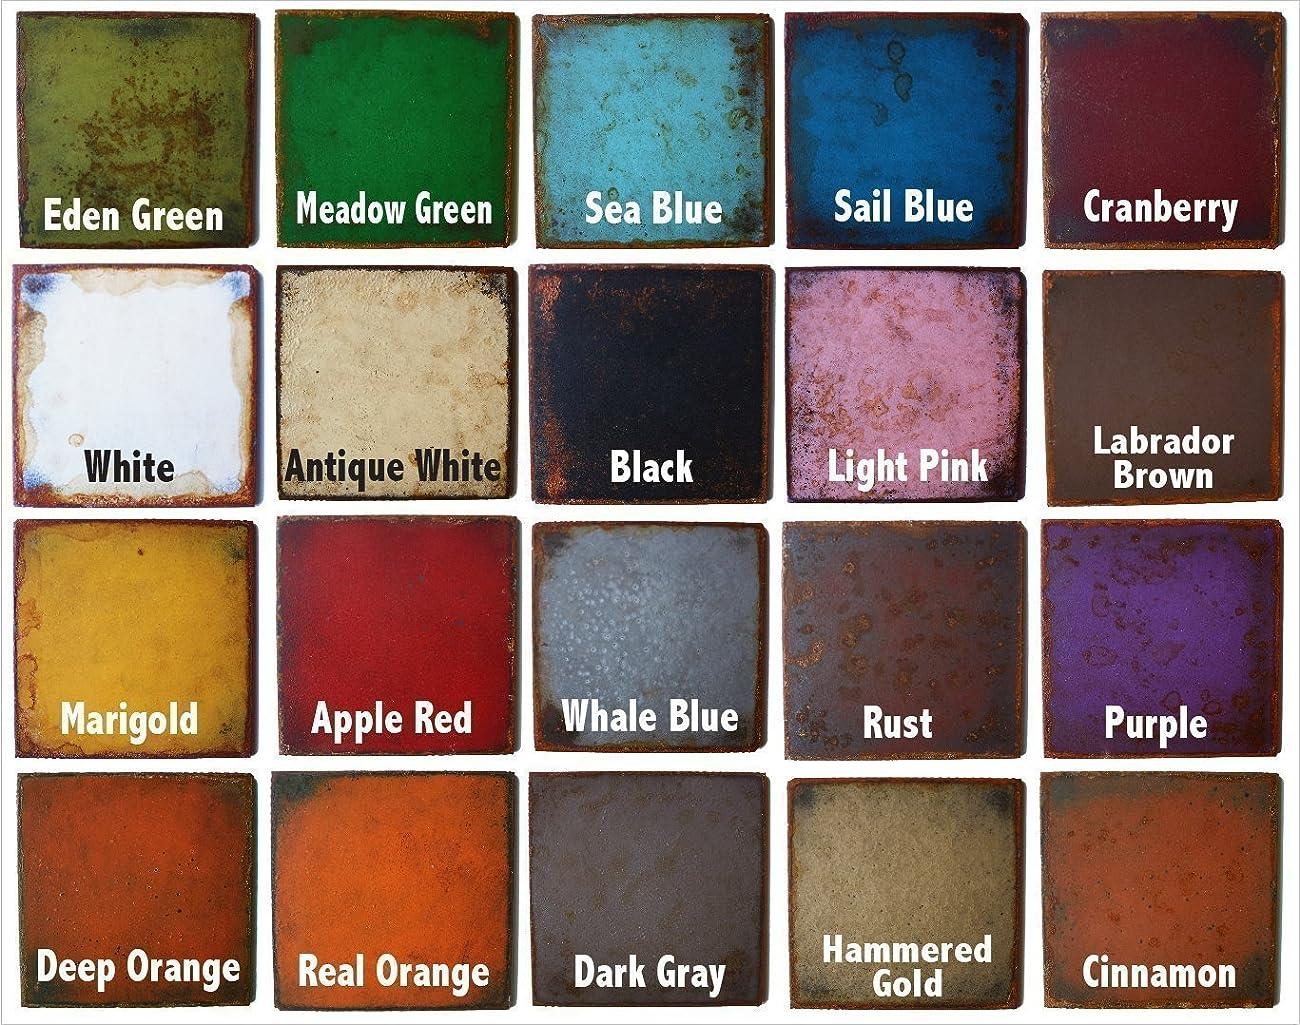 11 inch long eat metal wall art word - Handmade - Choose your patina color 1